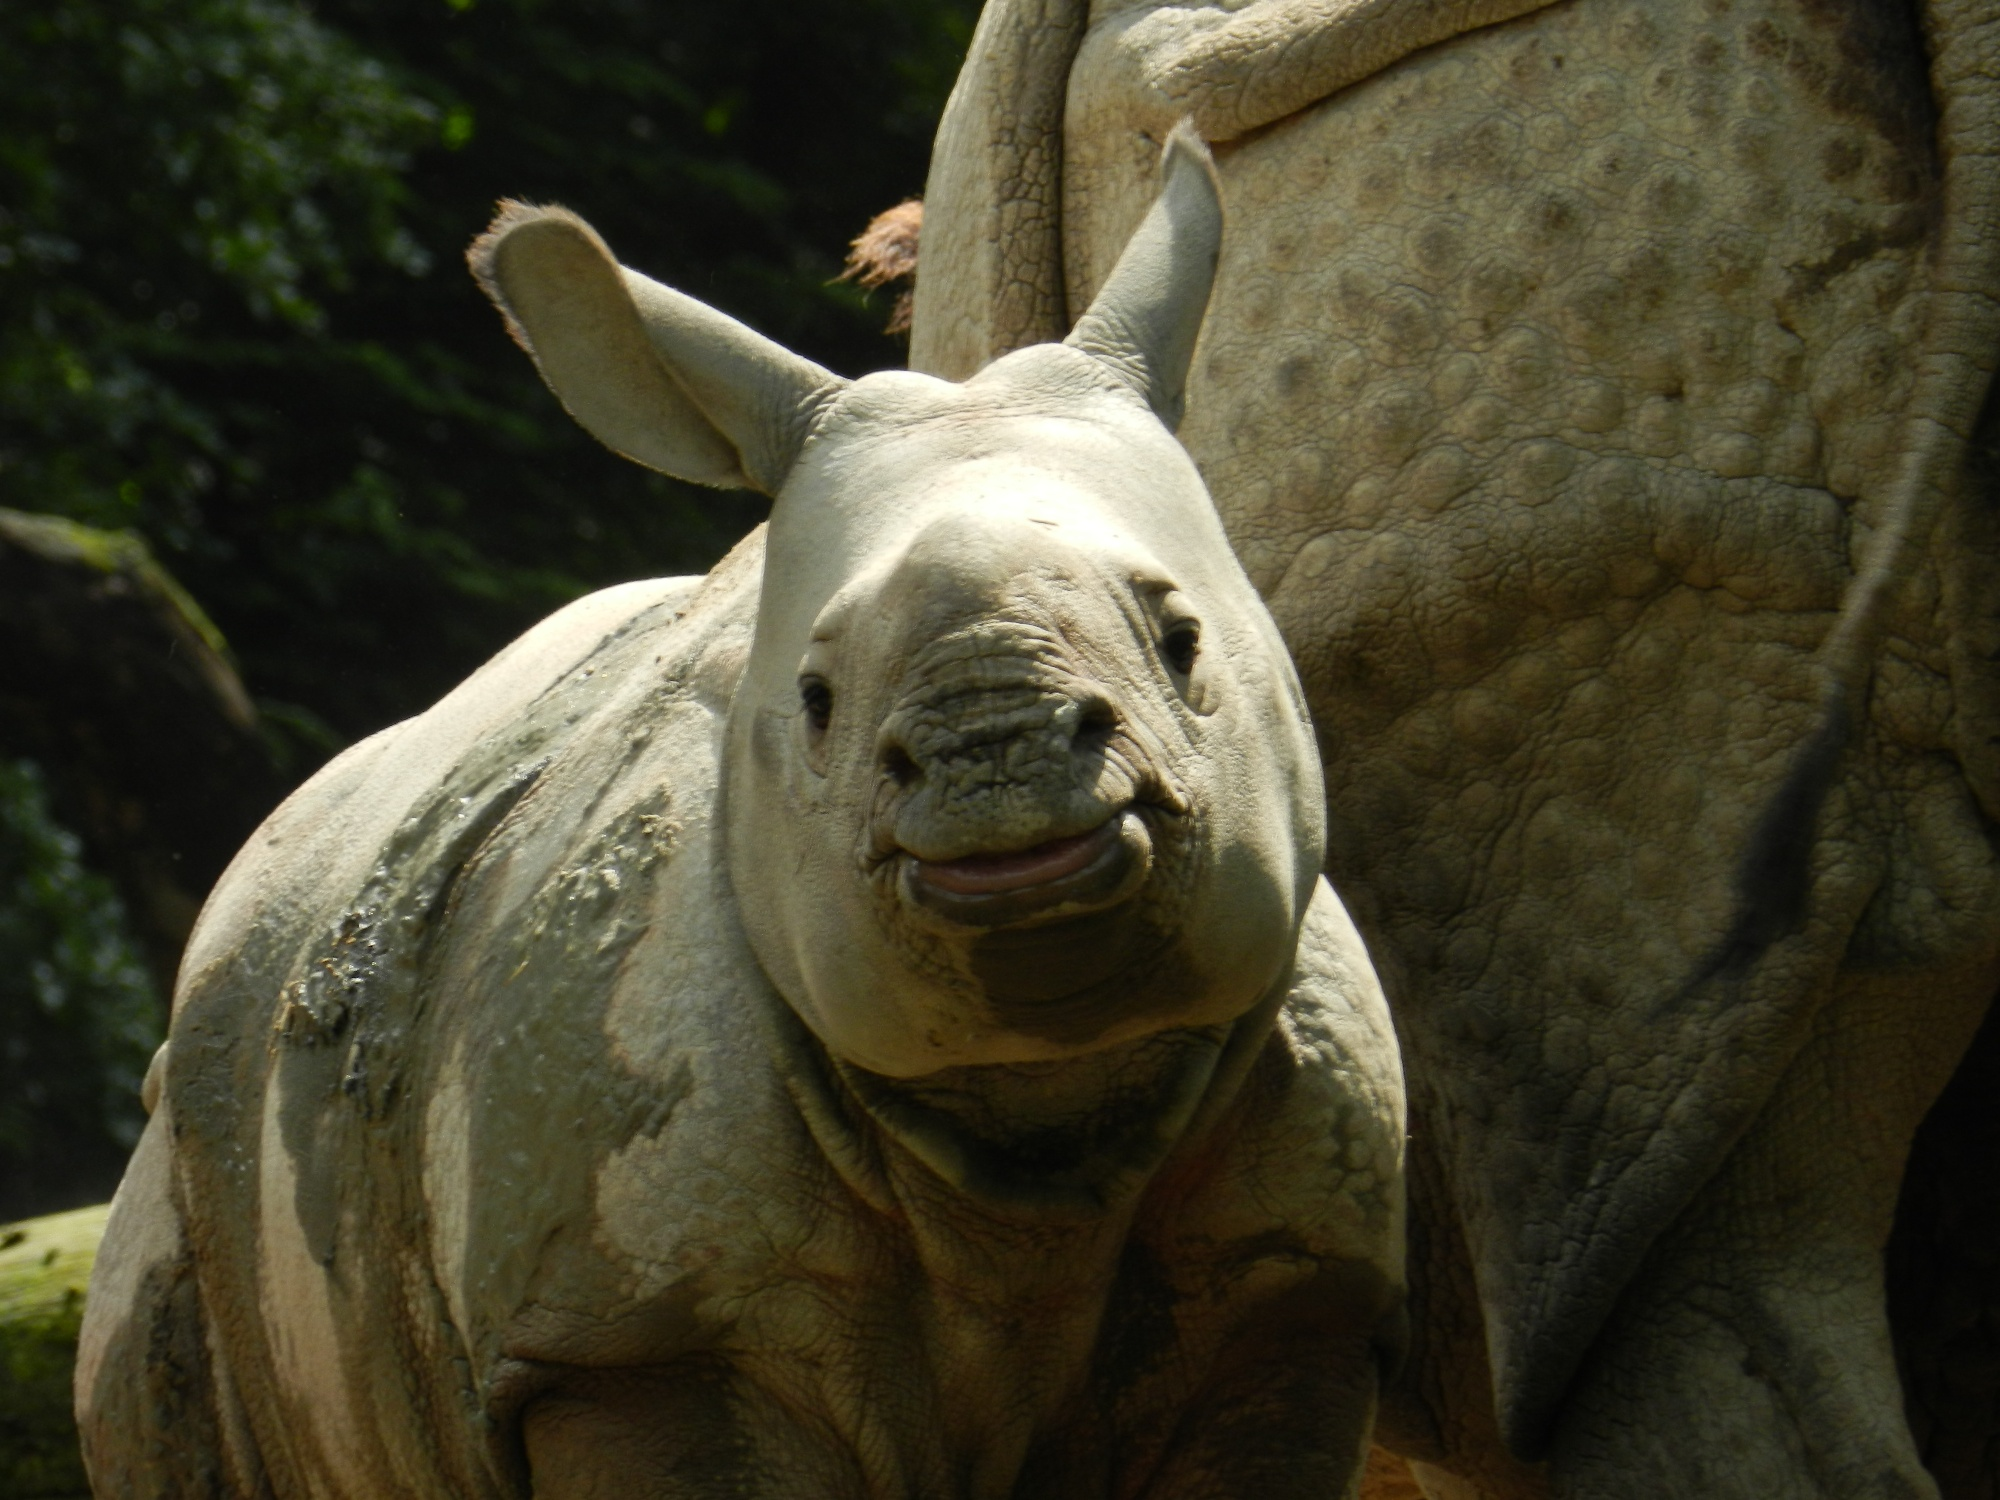 Jone neushoorn te Amersfoort